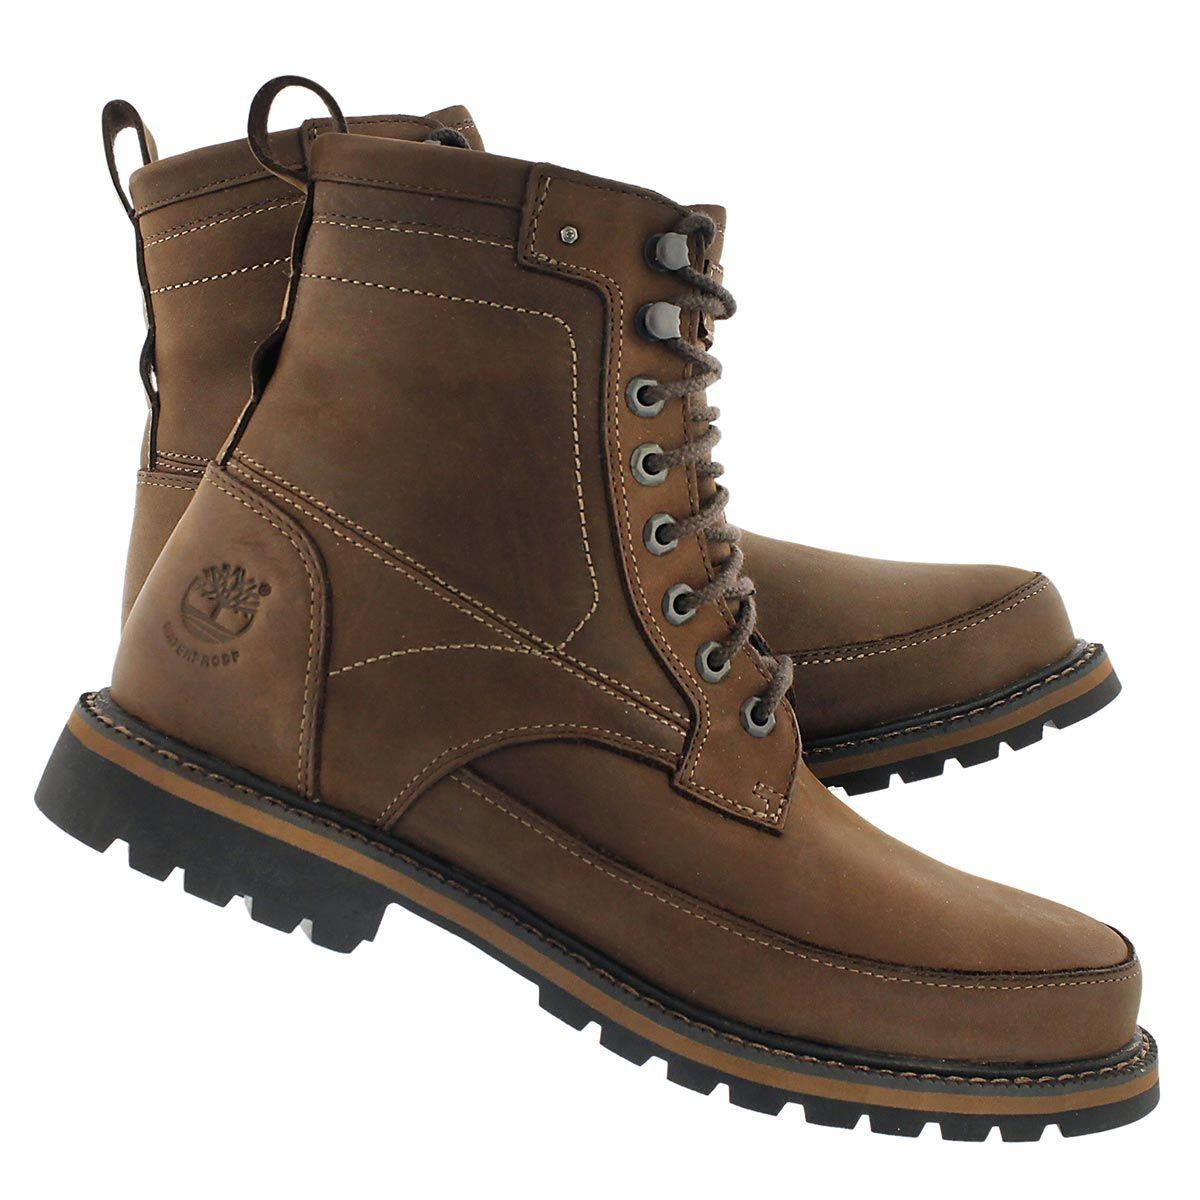 timberland men's chestnut ridge 8-inch waterproof boots